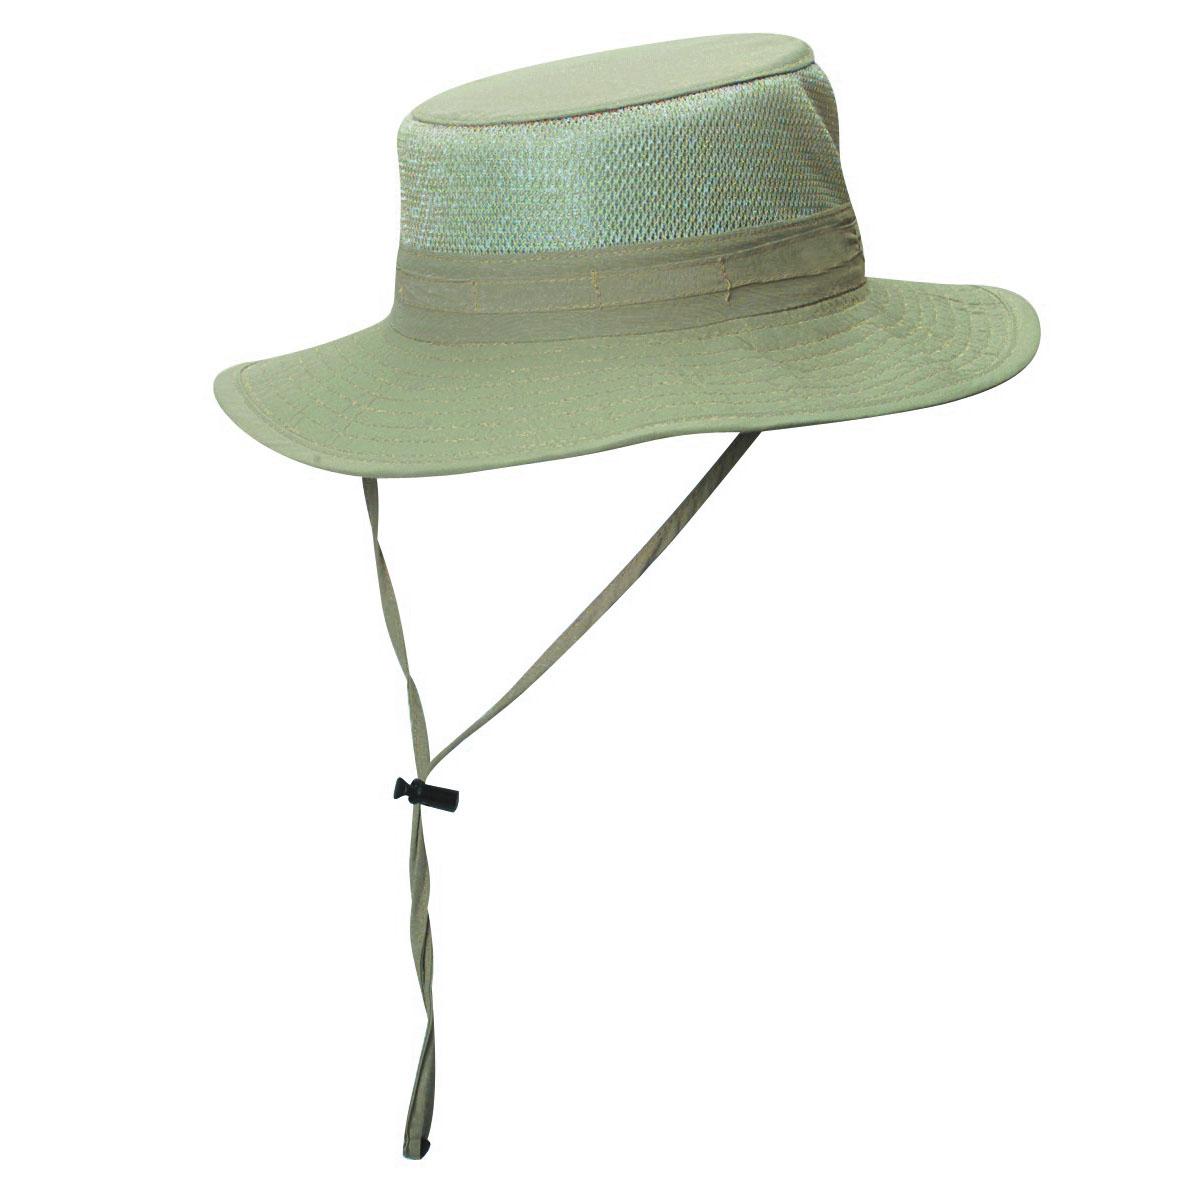 eea459e8db80d Supplex Nylon Boonie Hat with Mesh Sidewall Khaki